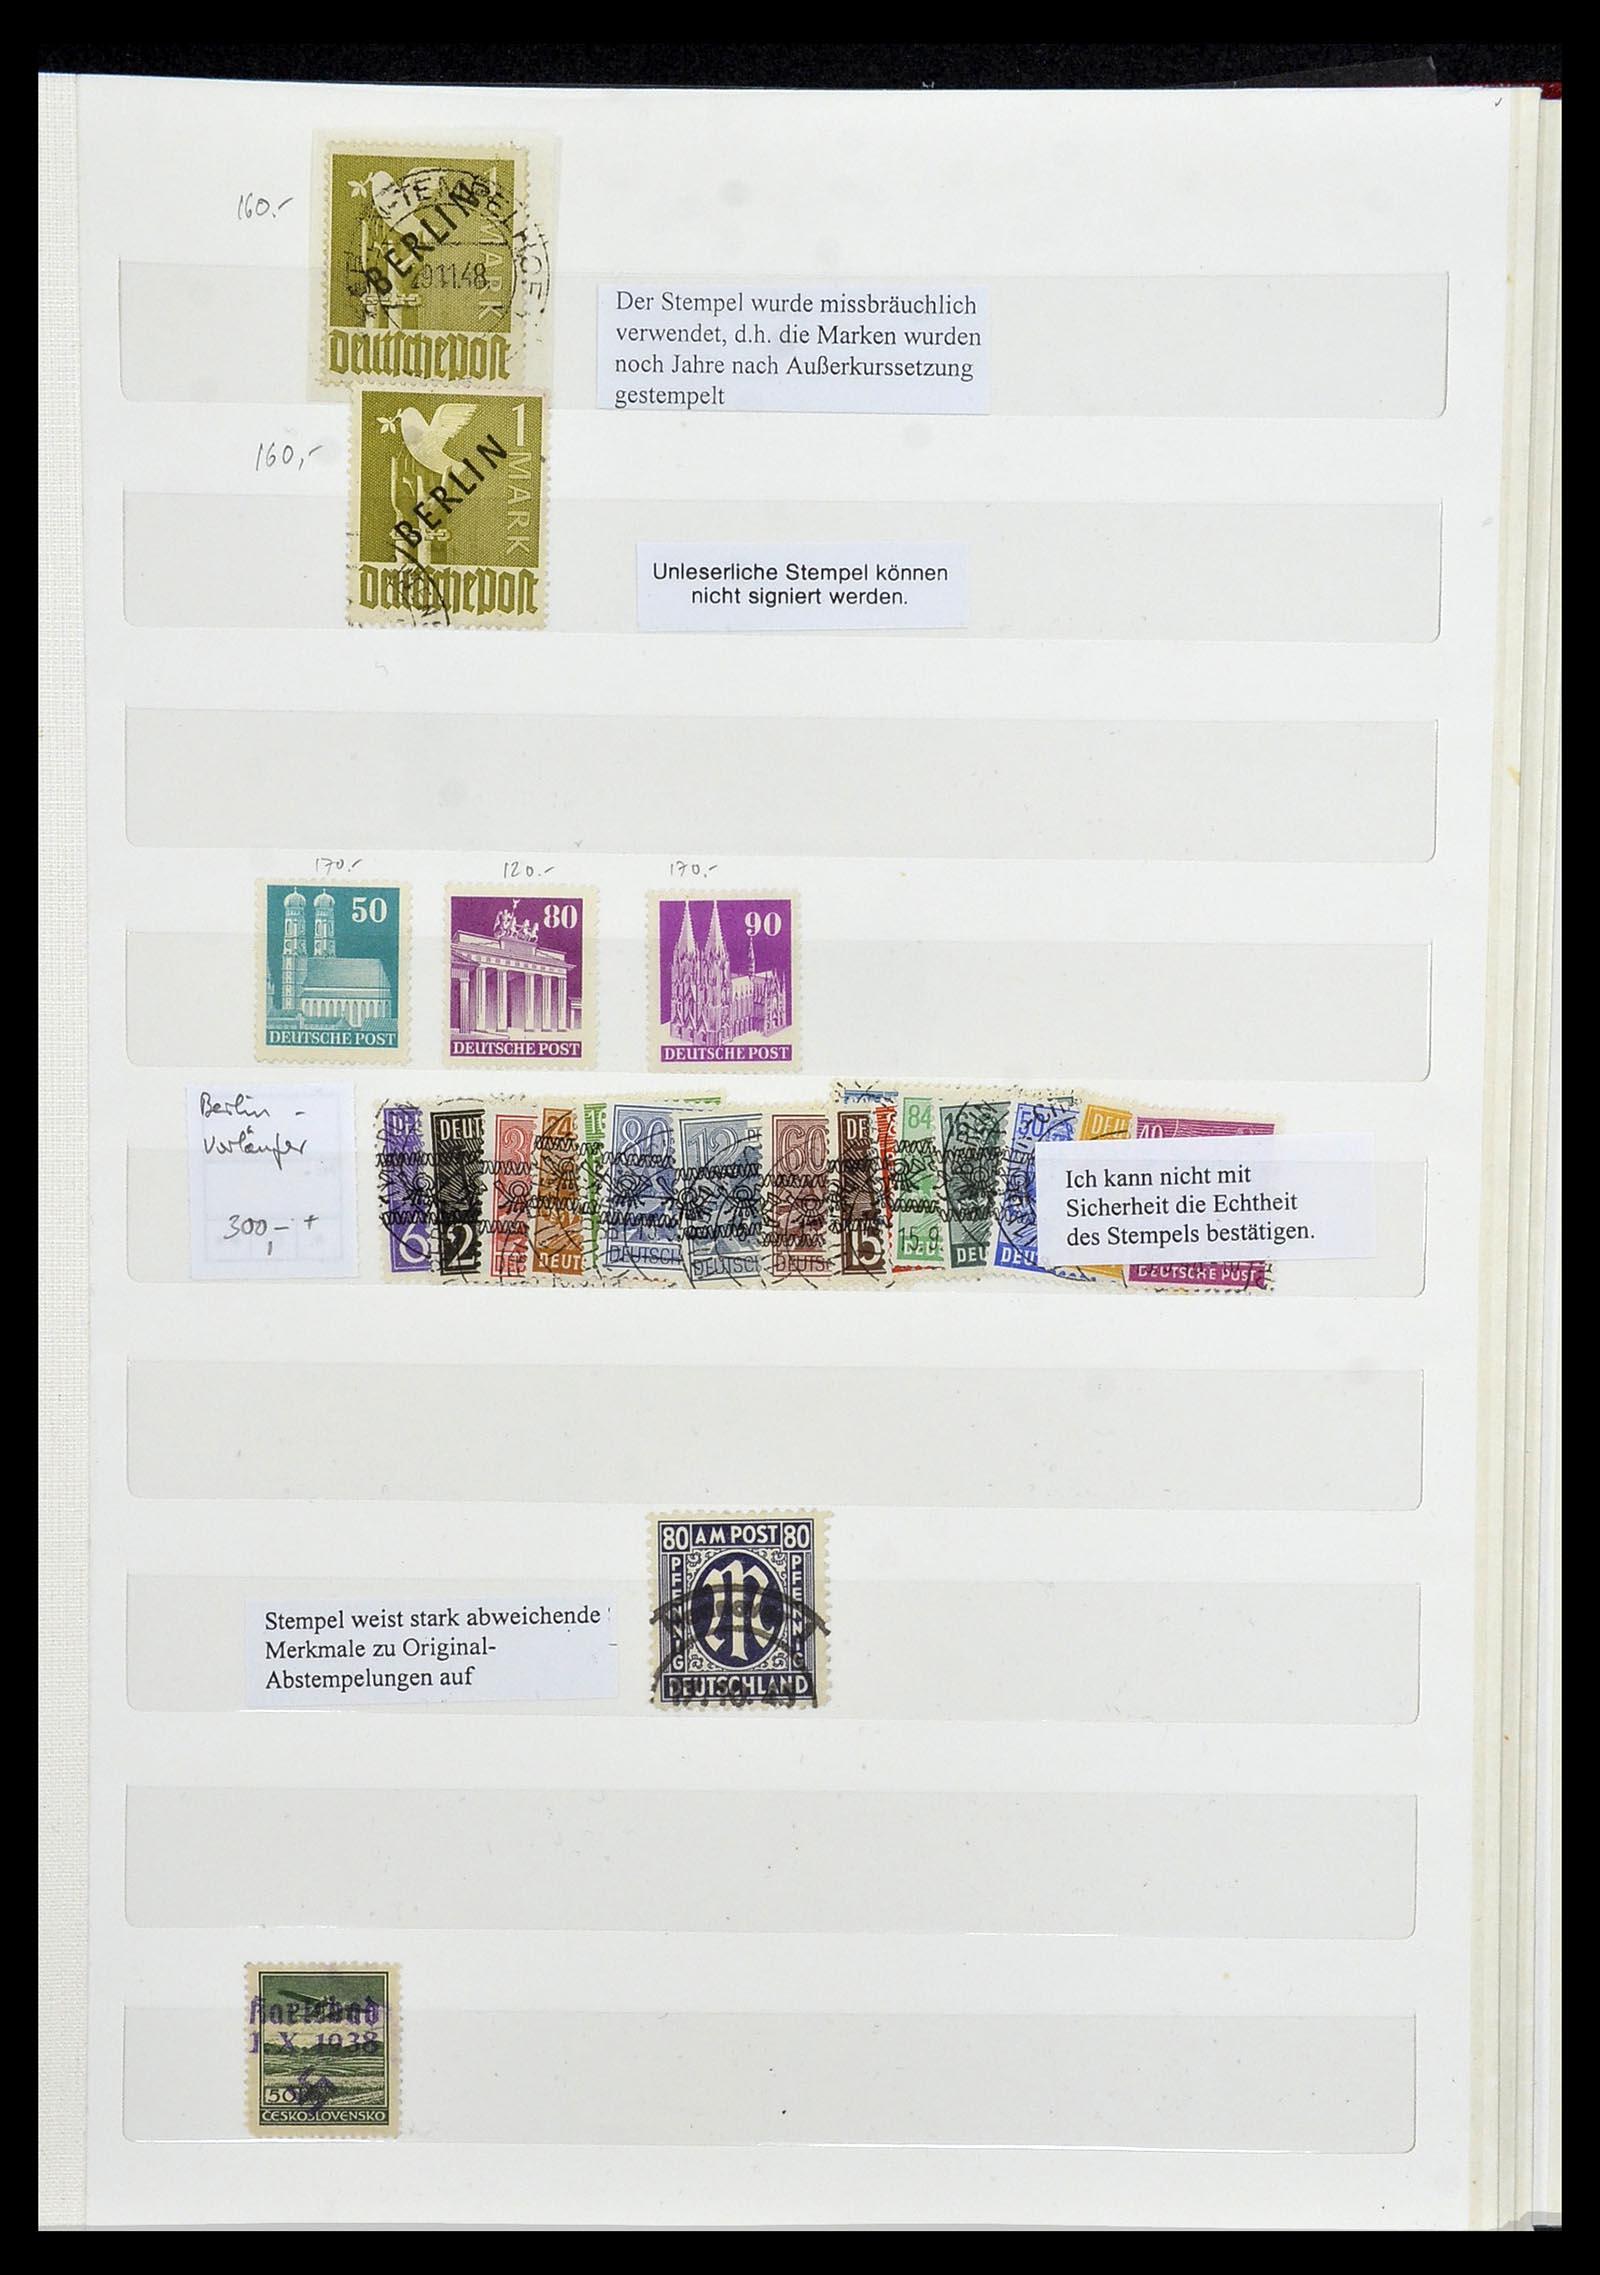 34069 010 - Postzegelverzameling 34069 Duitsland 1855-1952.